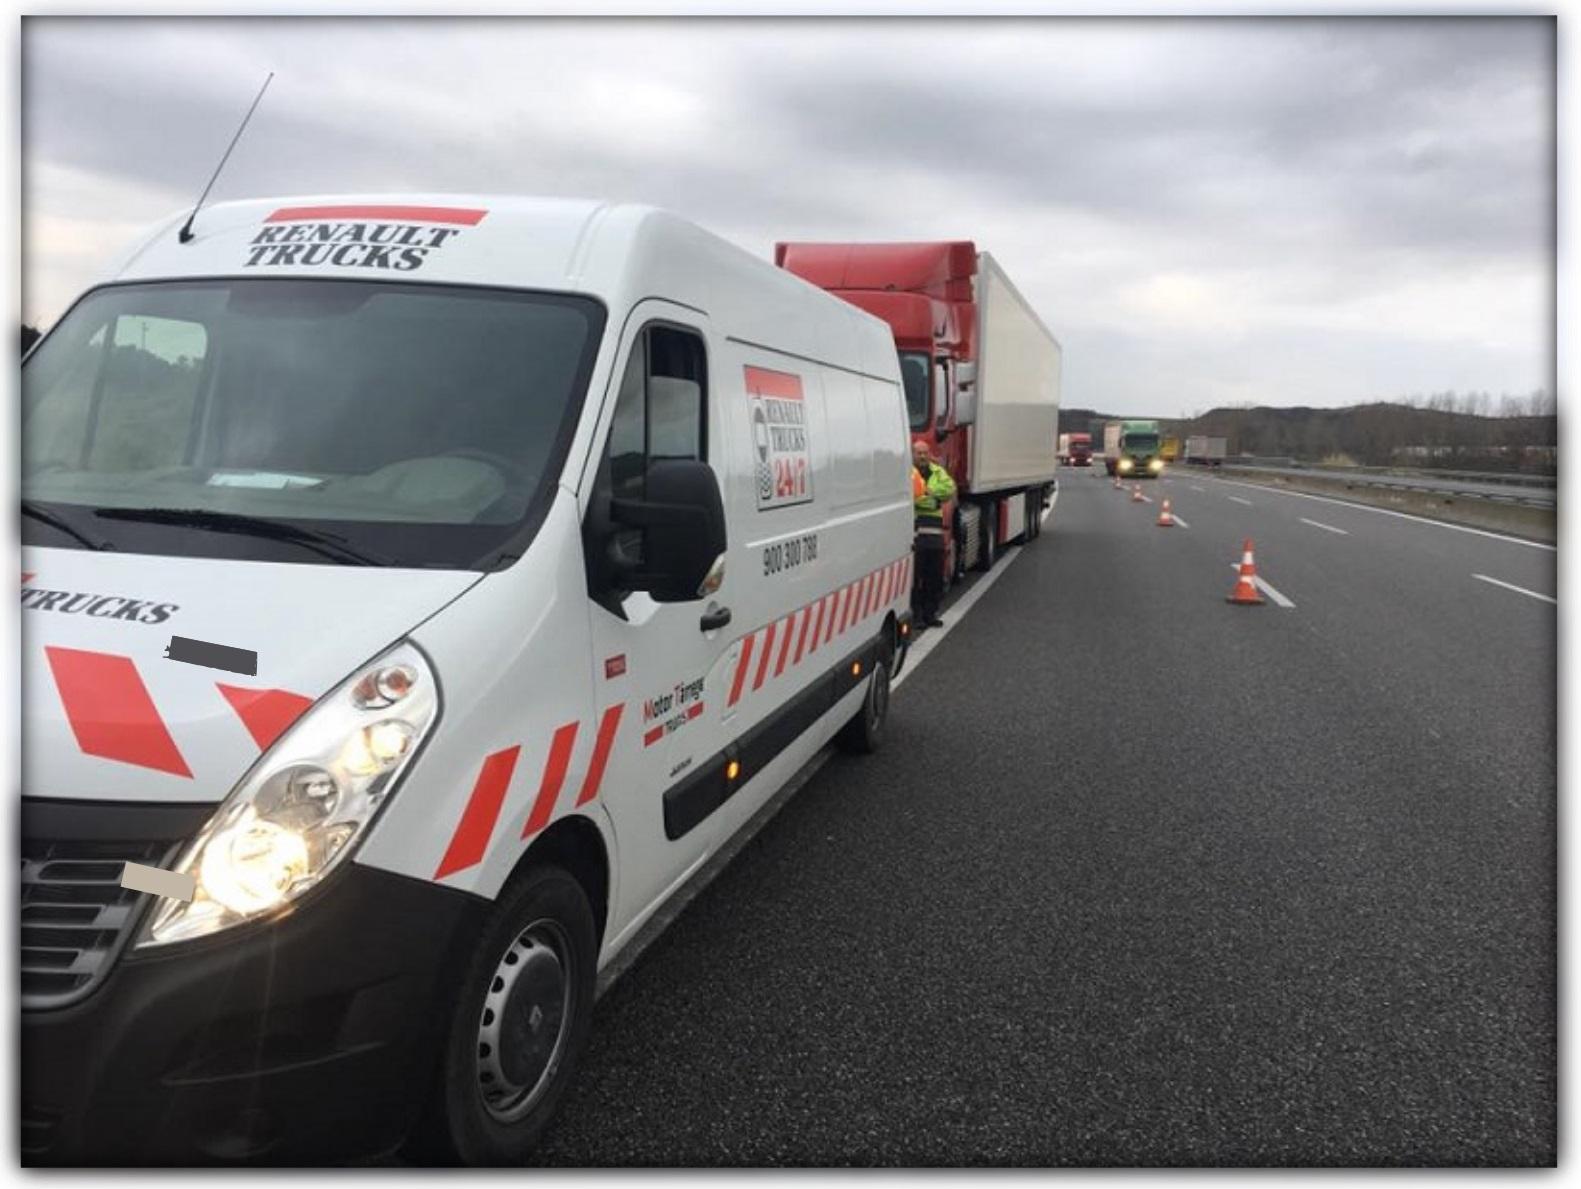 Asistencia En Carretera 24h 365 D As Motor T Rrega Trucks